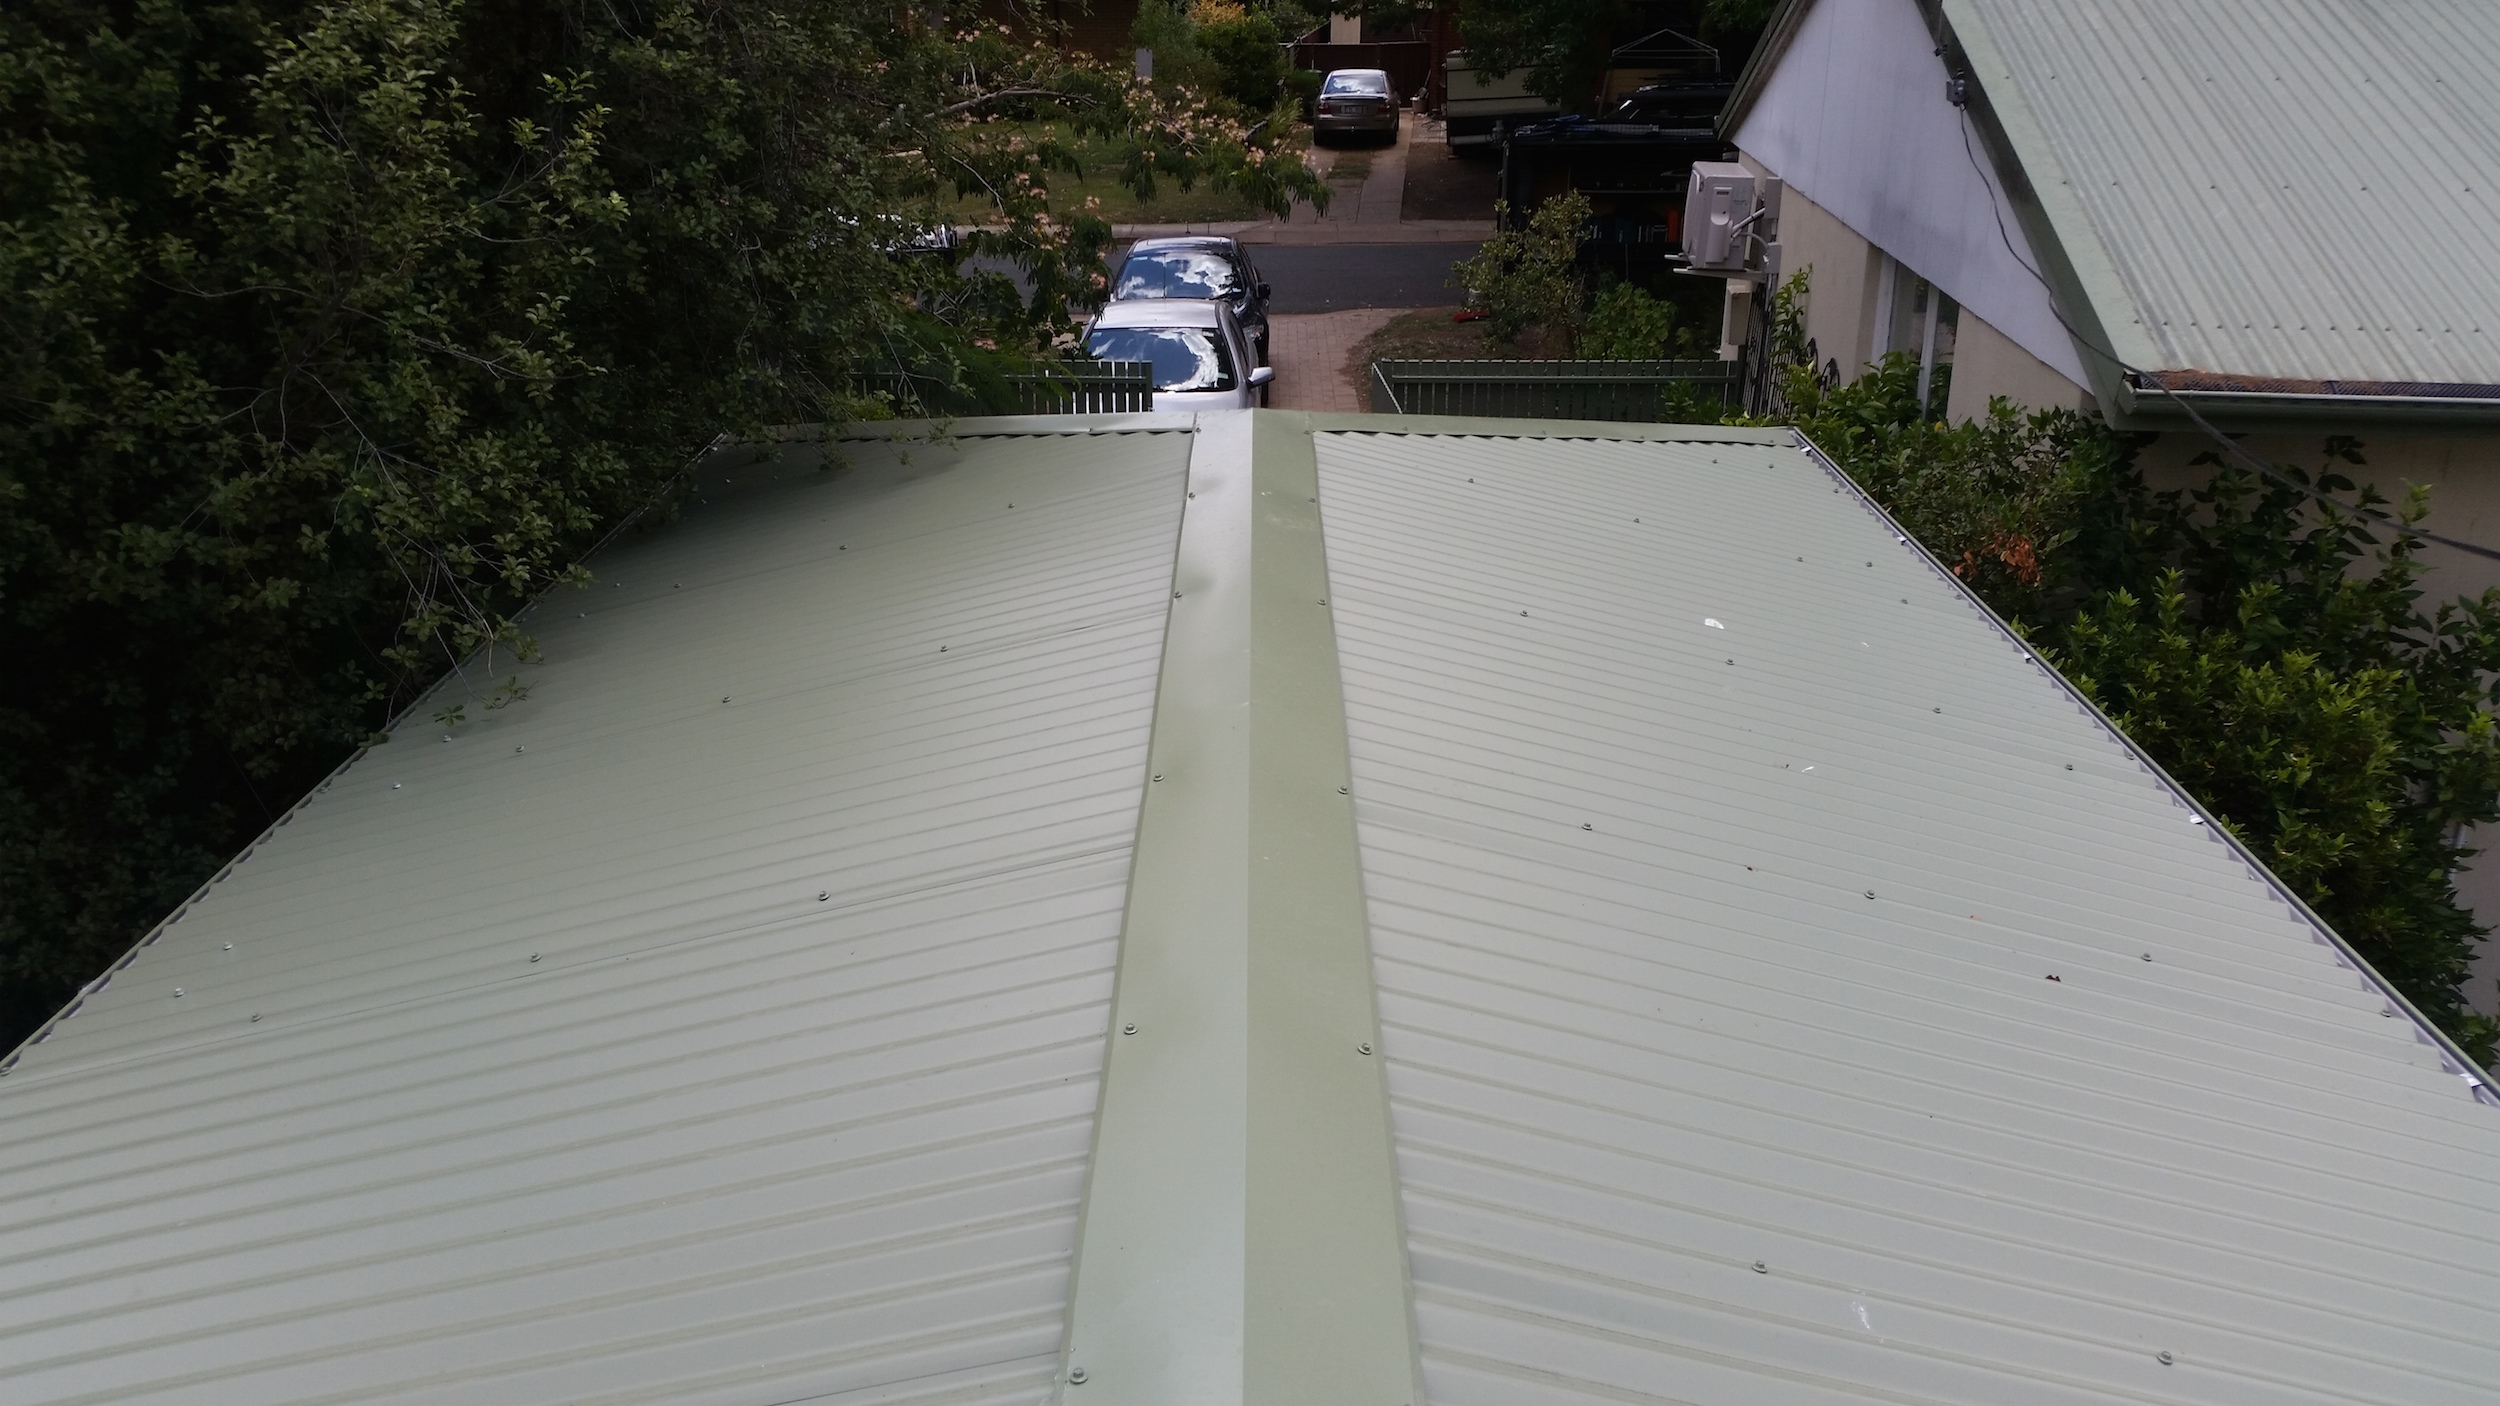 Hipped roof pergola